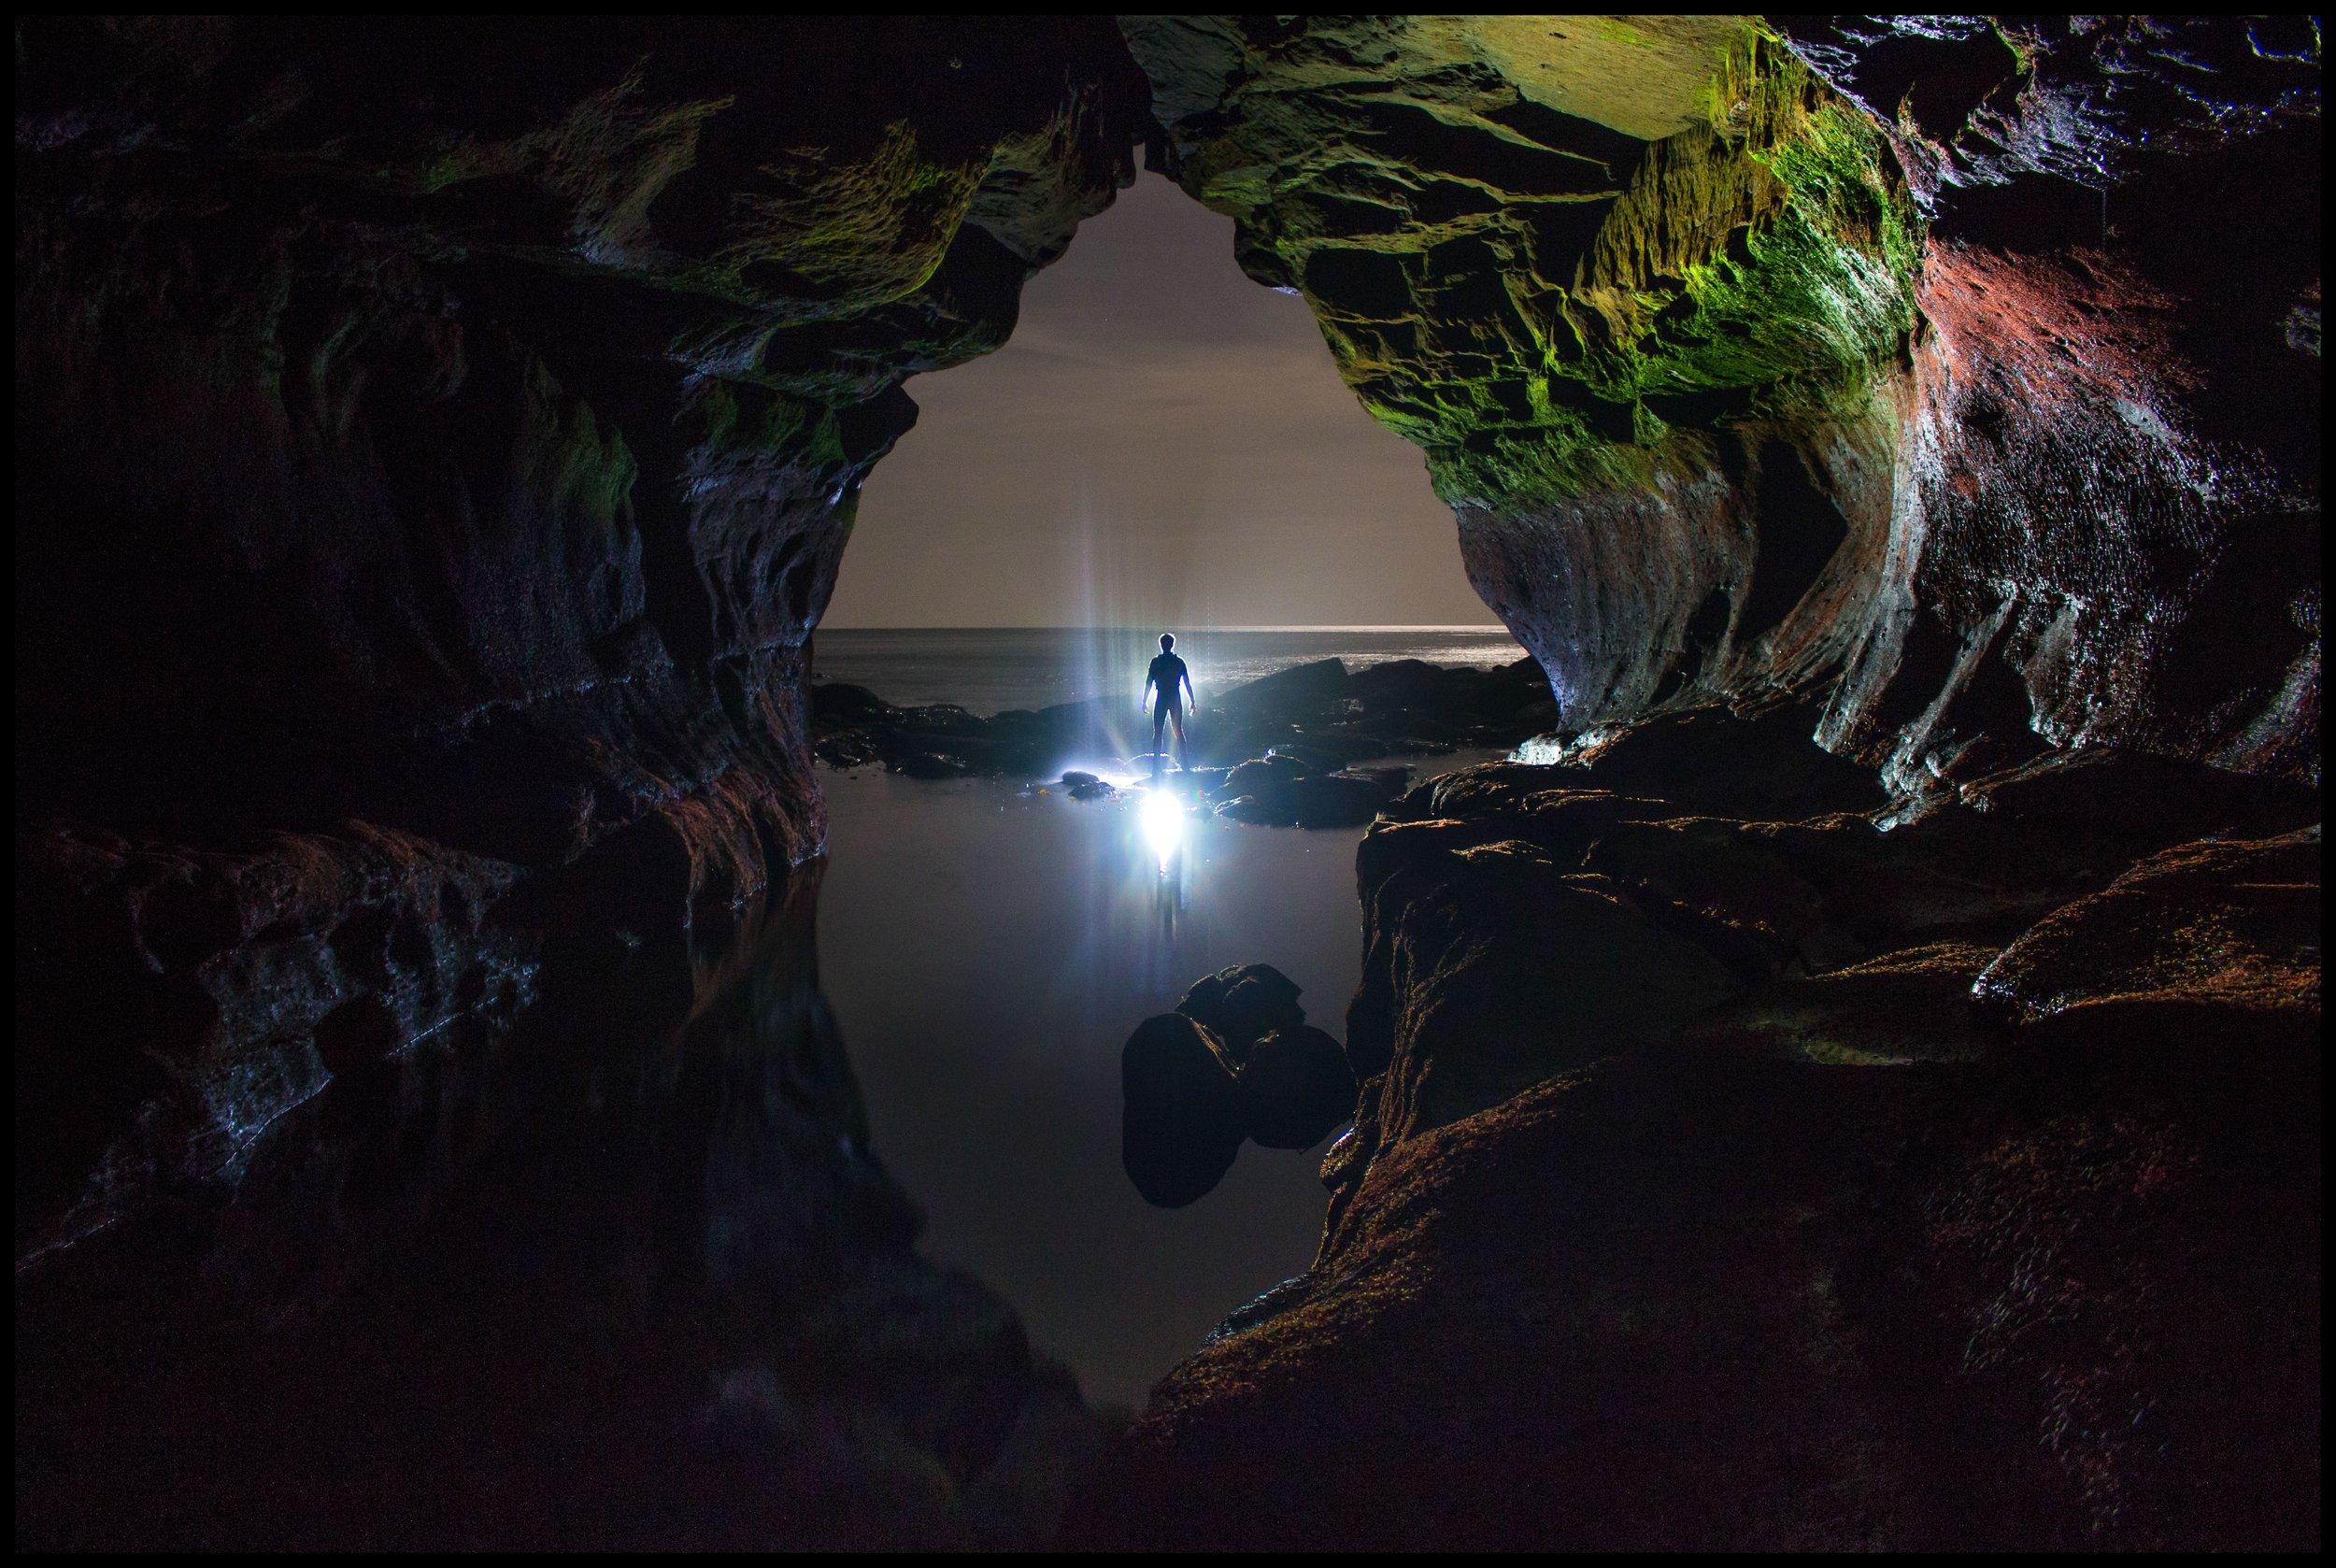 Sea cave, Berwick-upon-Tweed